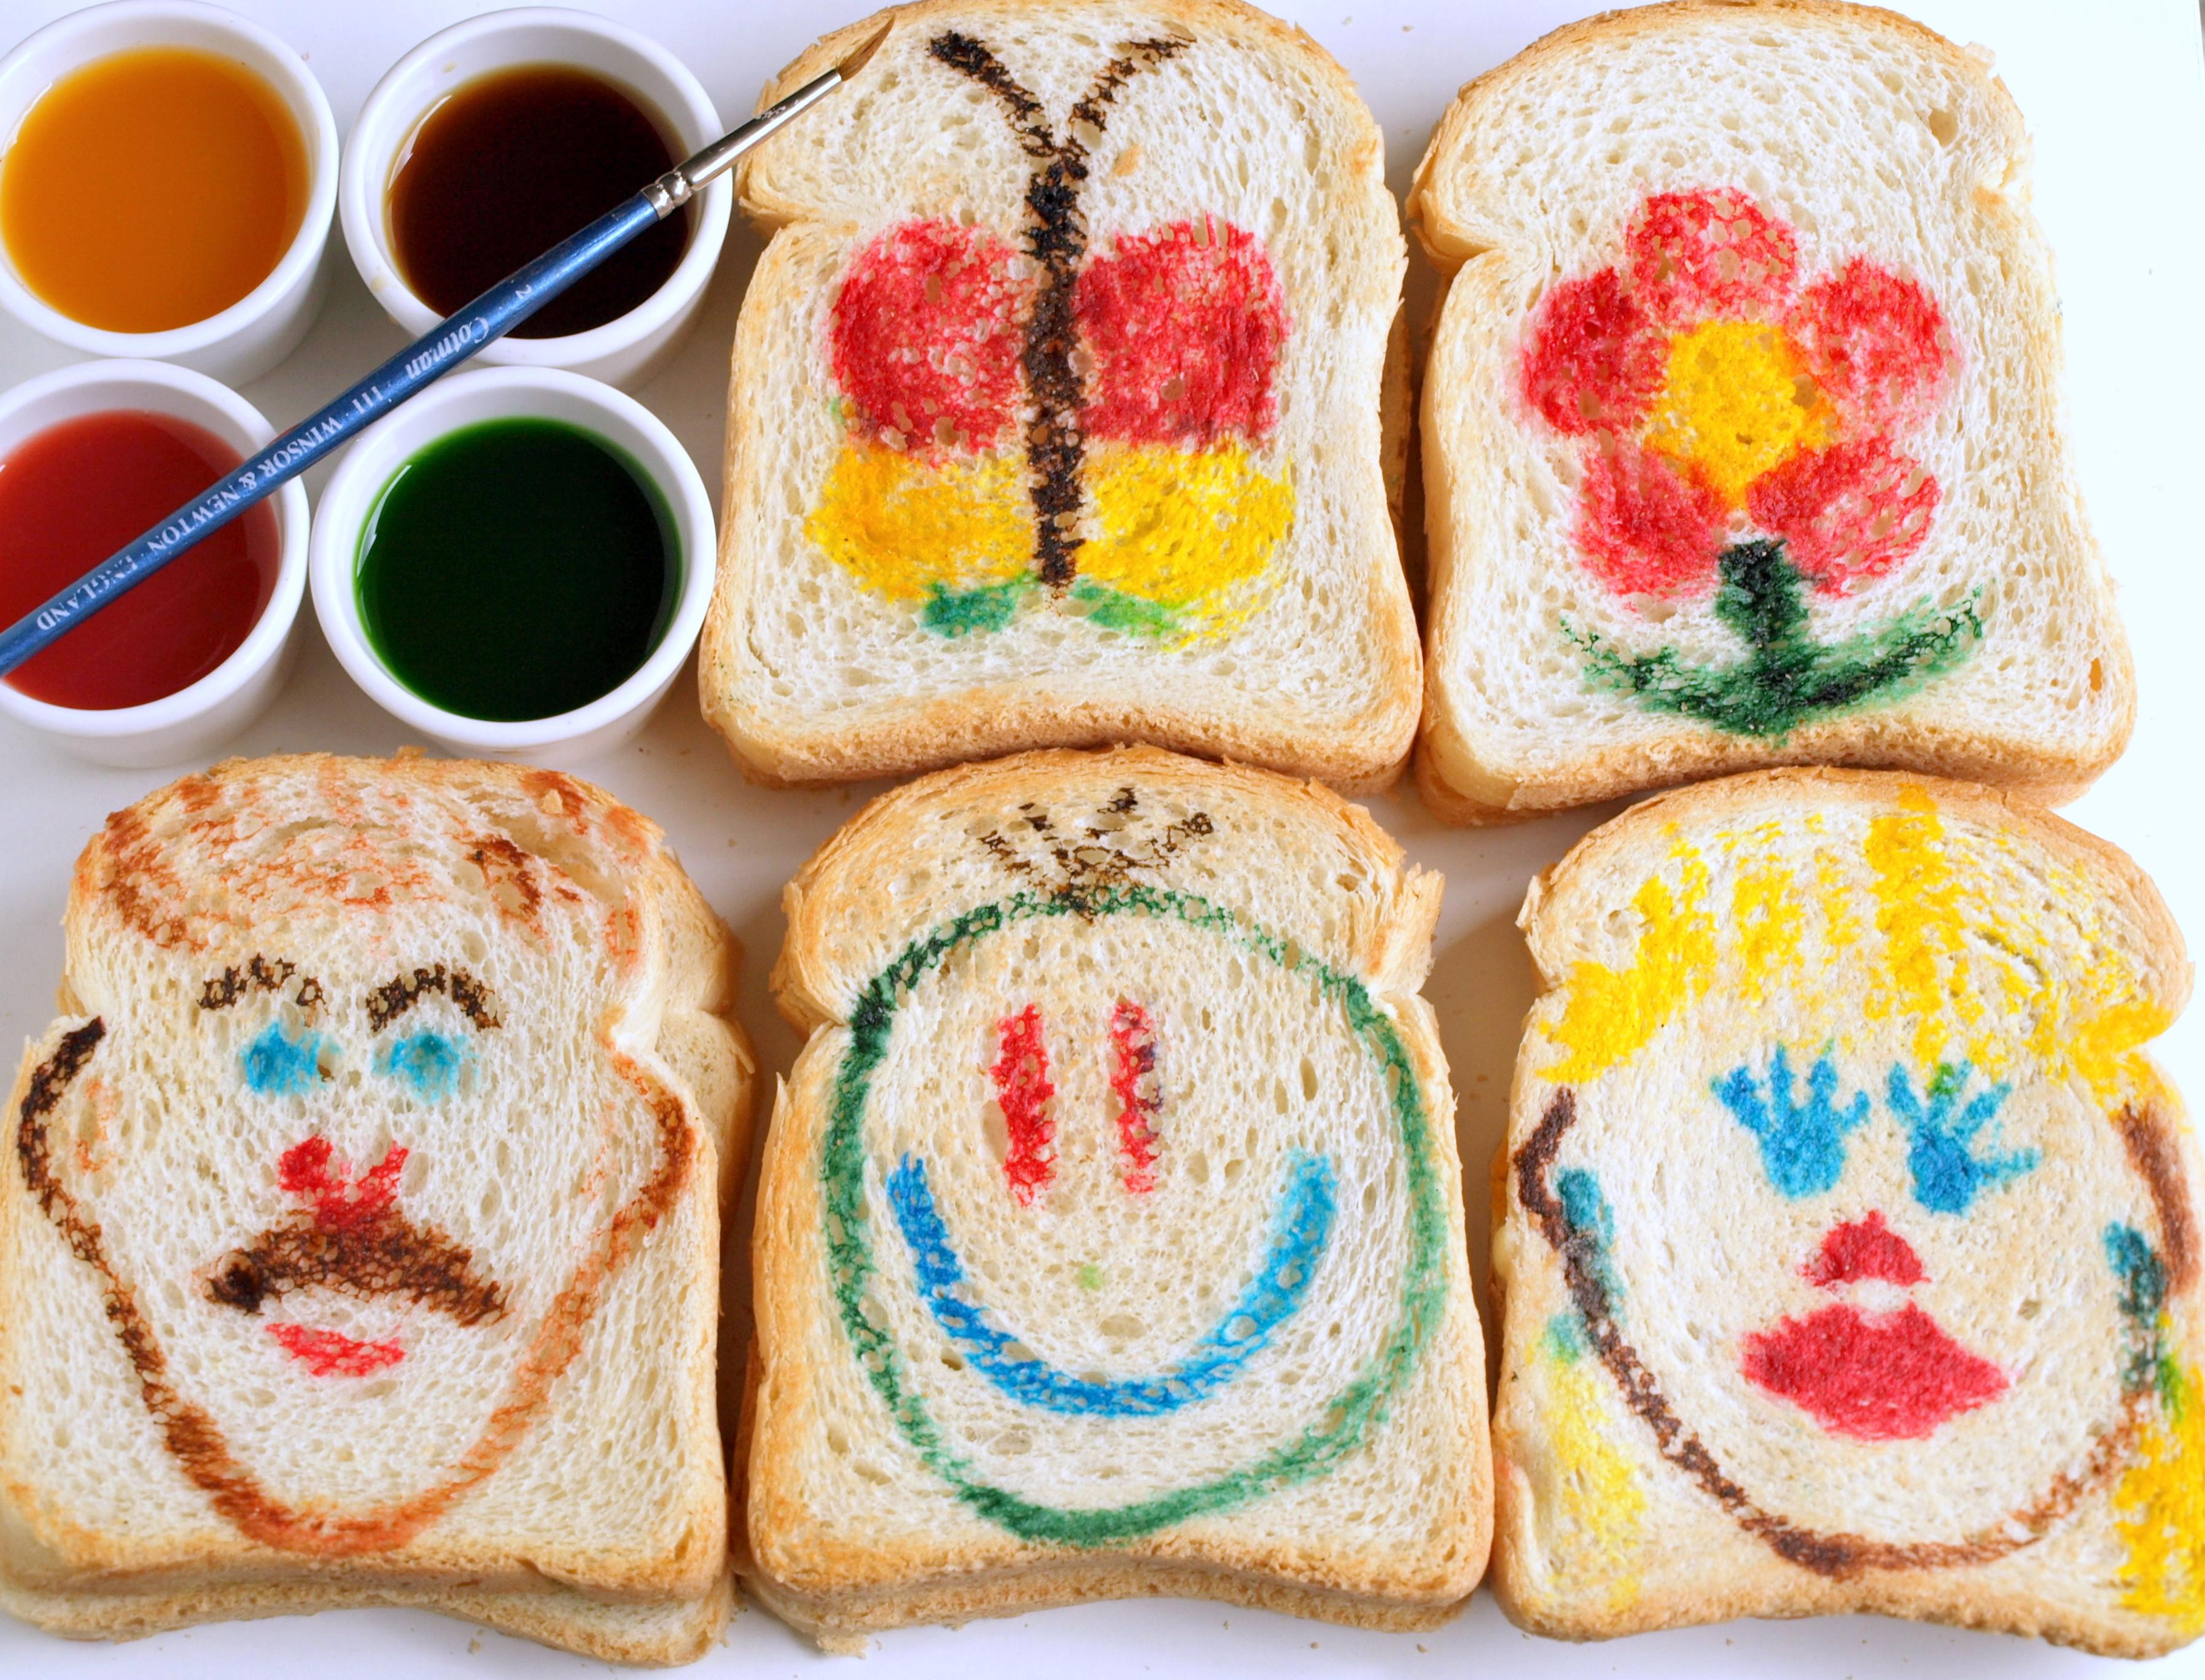 dipingere sui panini